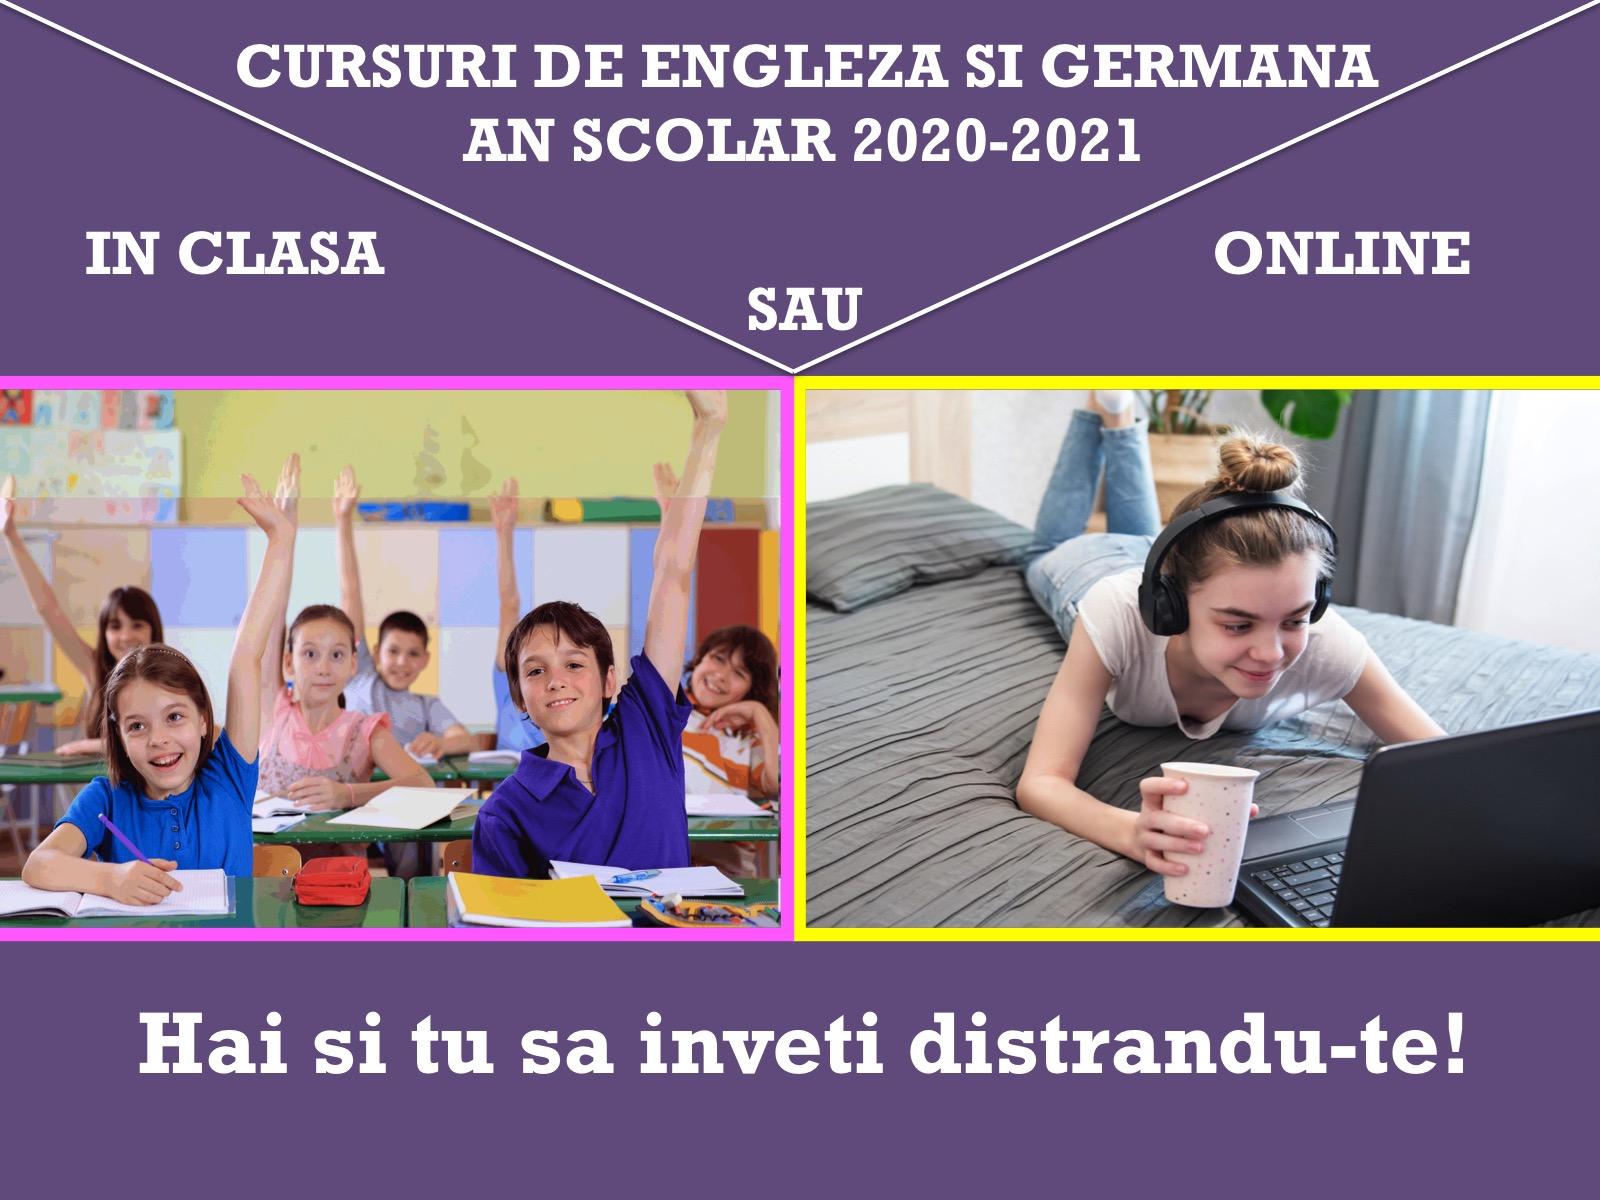 In clasa sau online, expertii Mayflower Centre sunt bucurosi sa ii indrume pe copii in demersul asmiliarii limbilor engleza si germana.